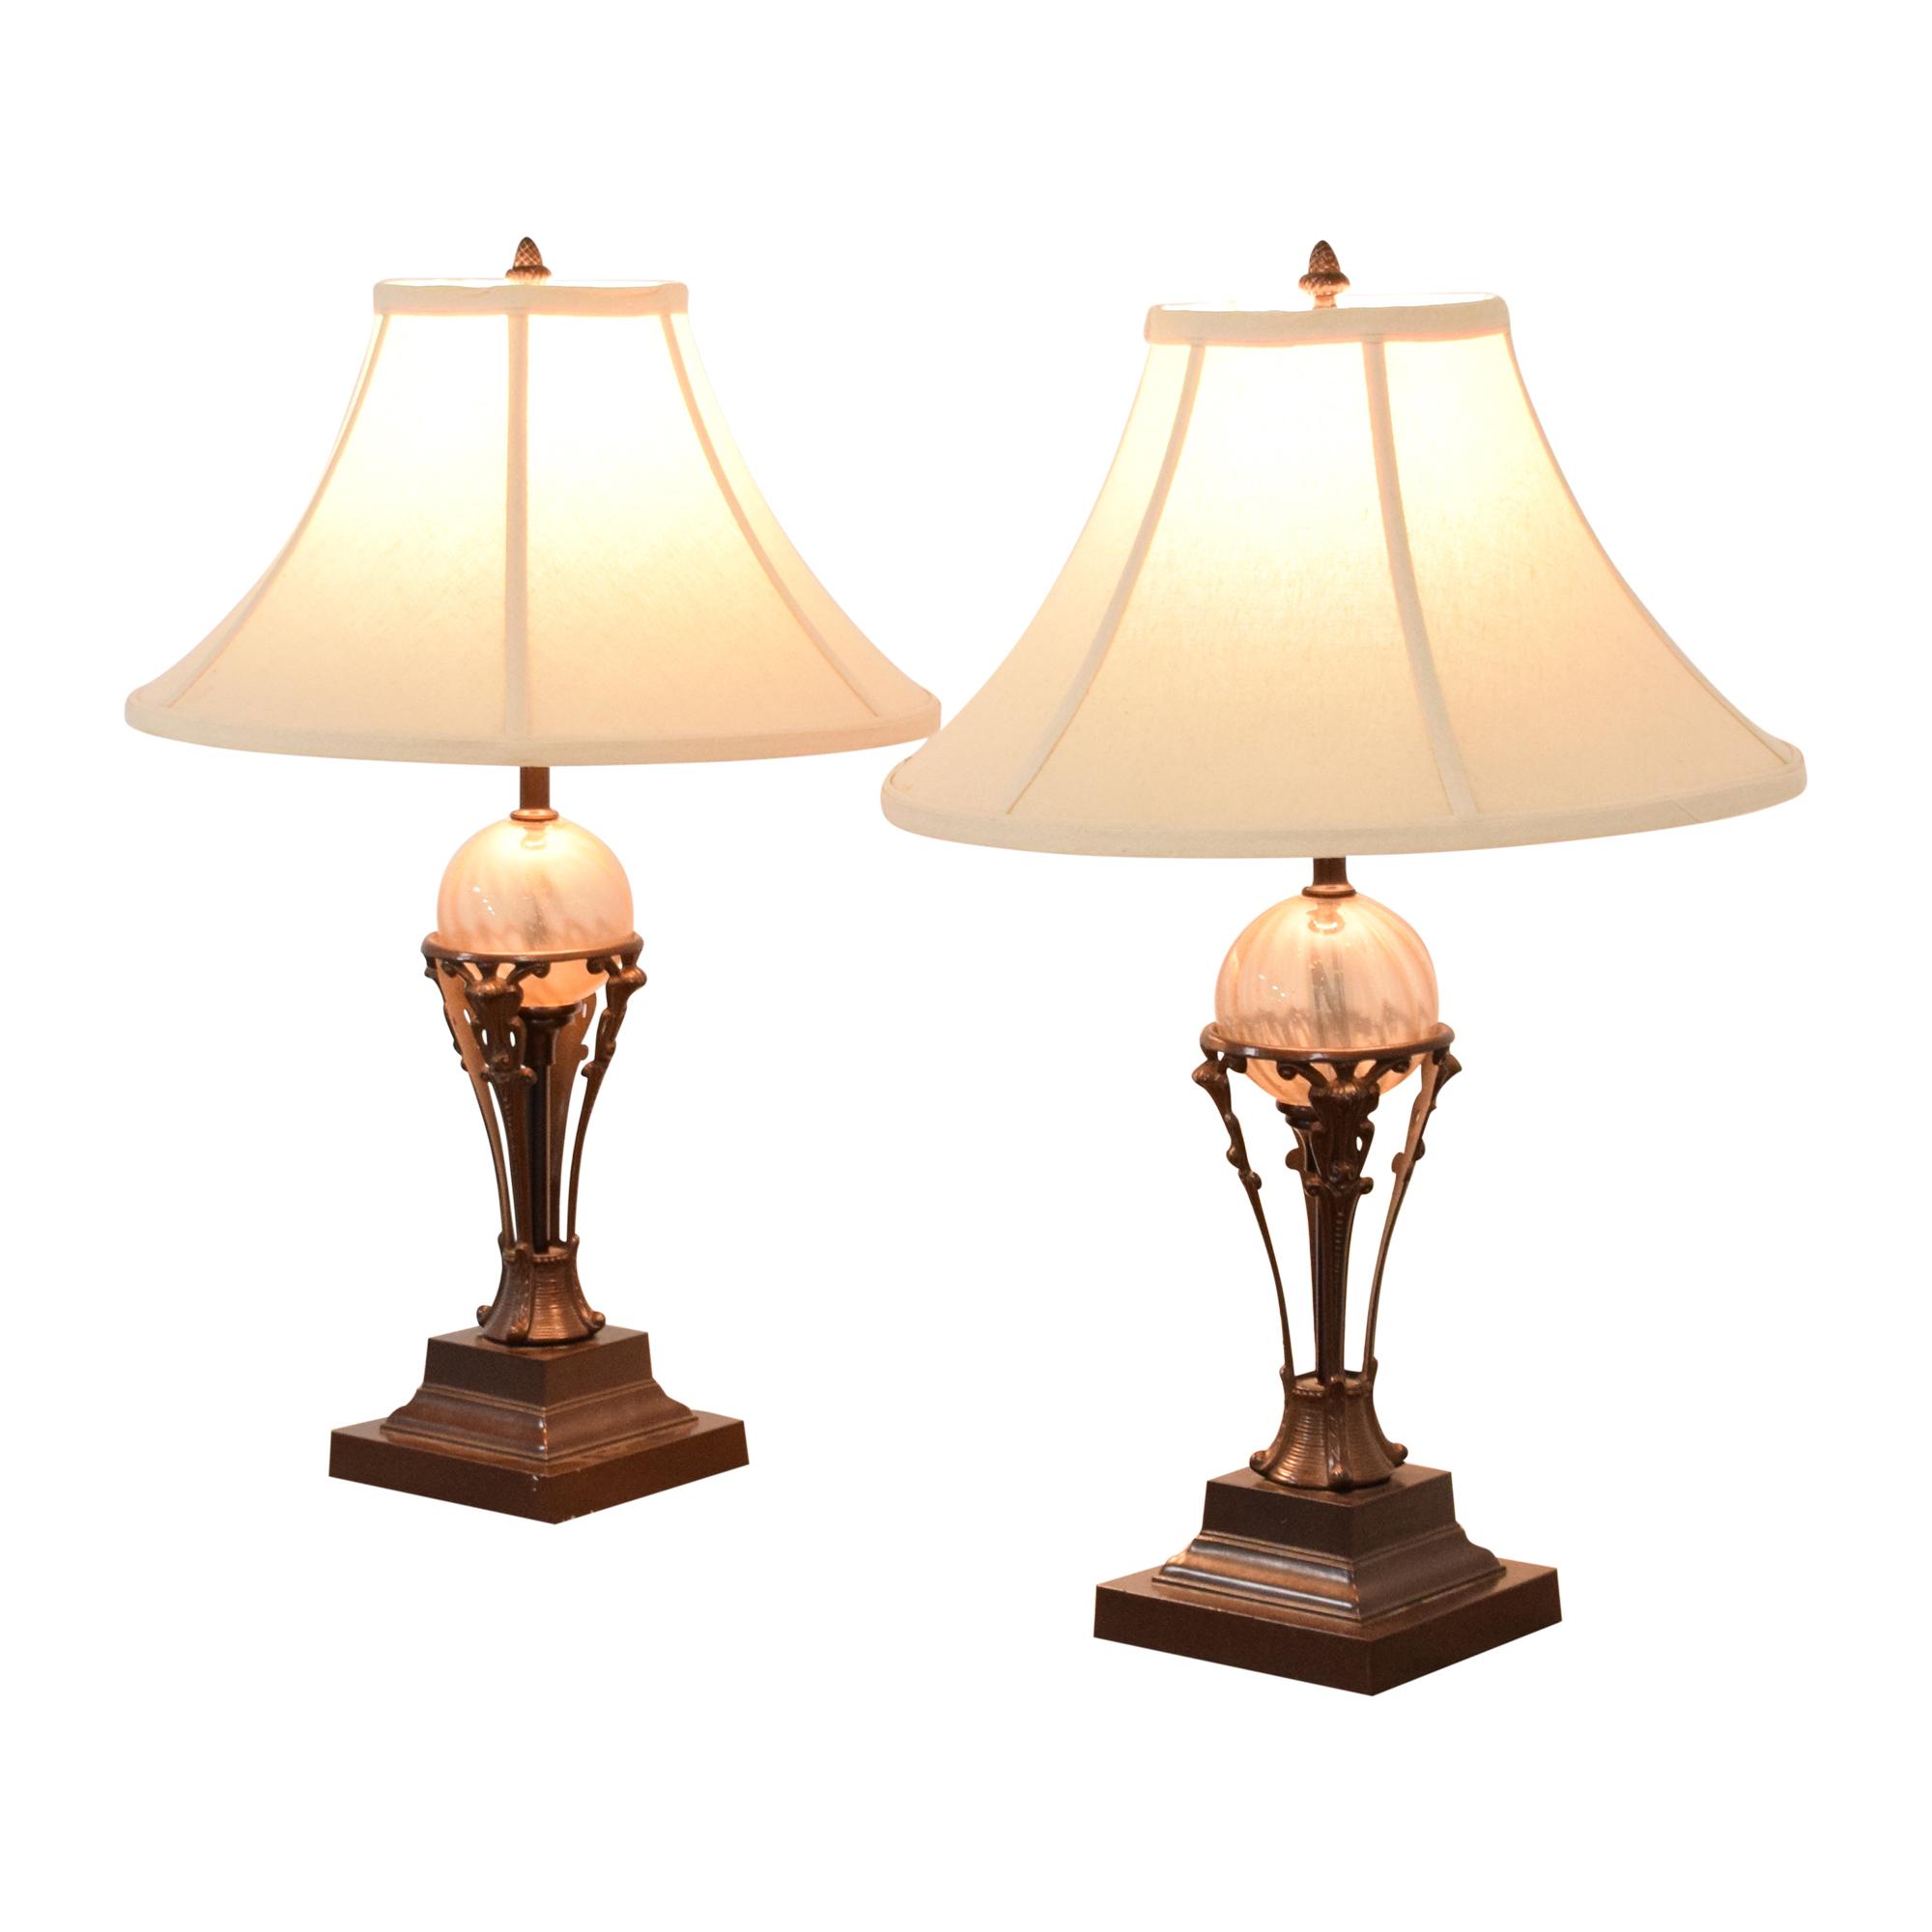 Restoration Hardware Restoration Hardware Table Lamps discount